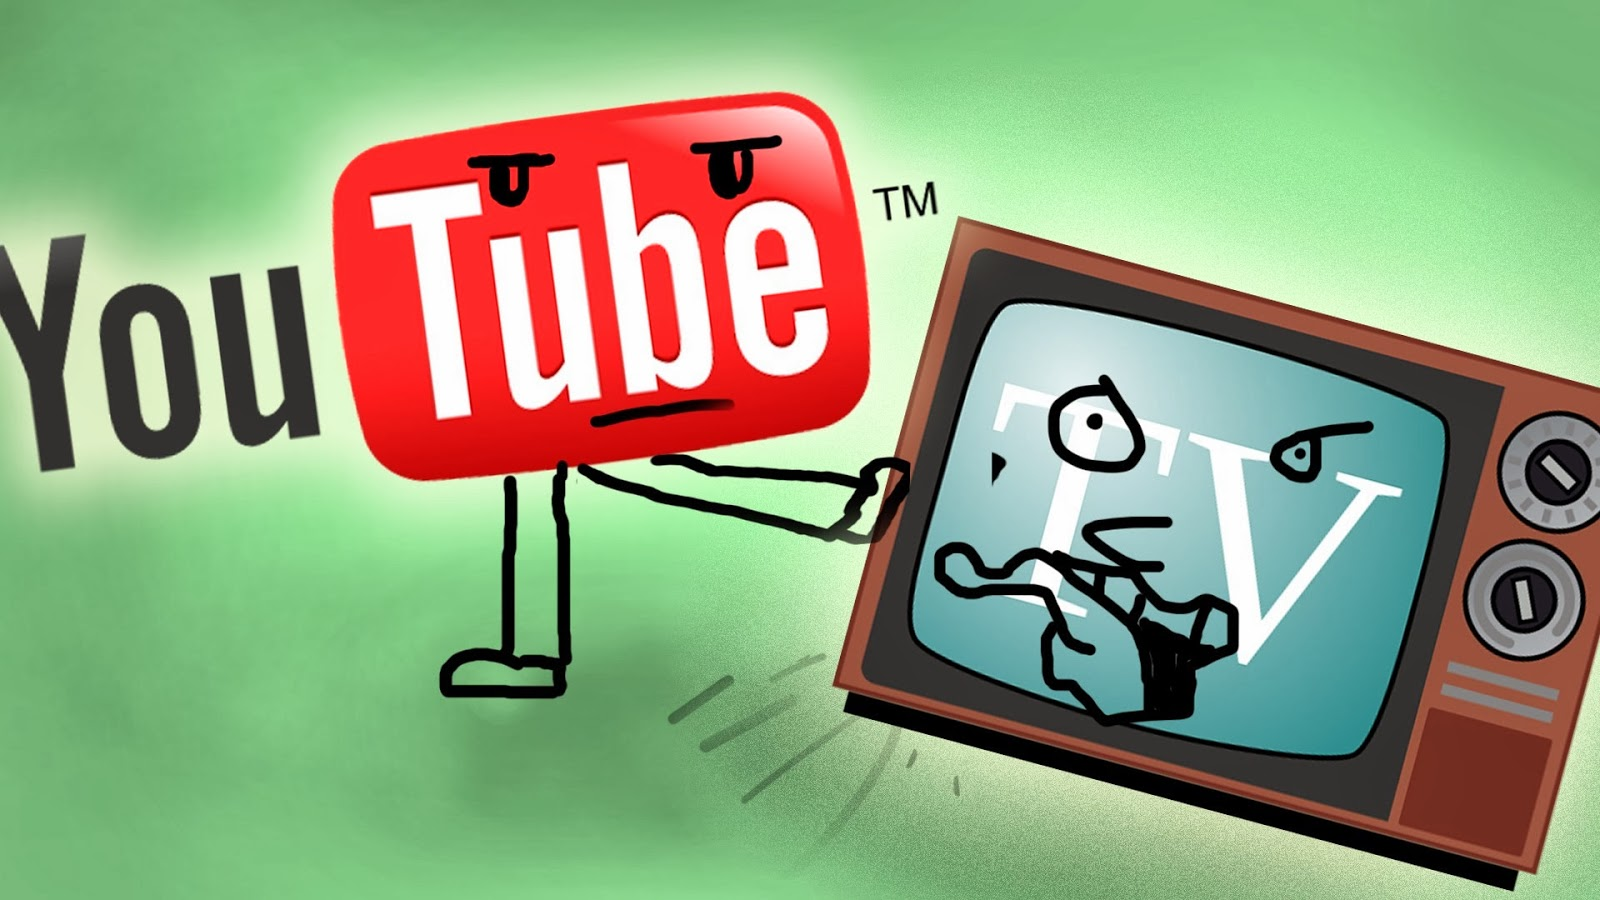 Youtube-Television